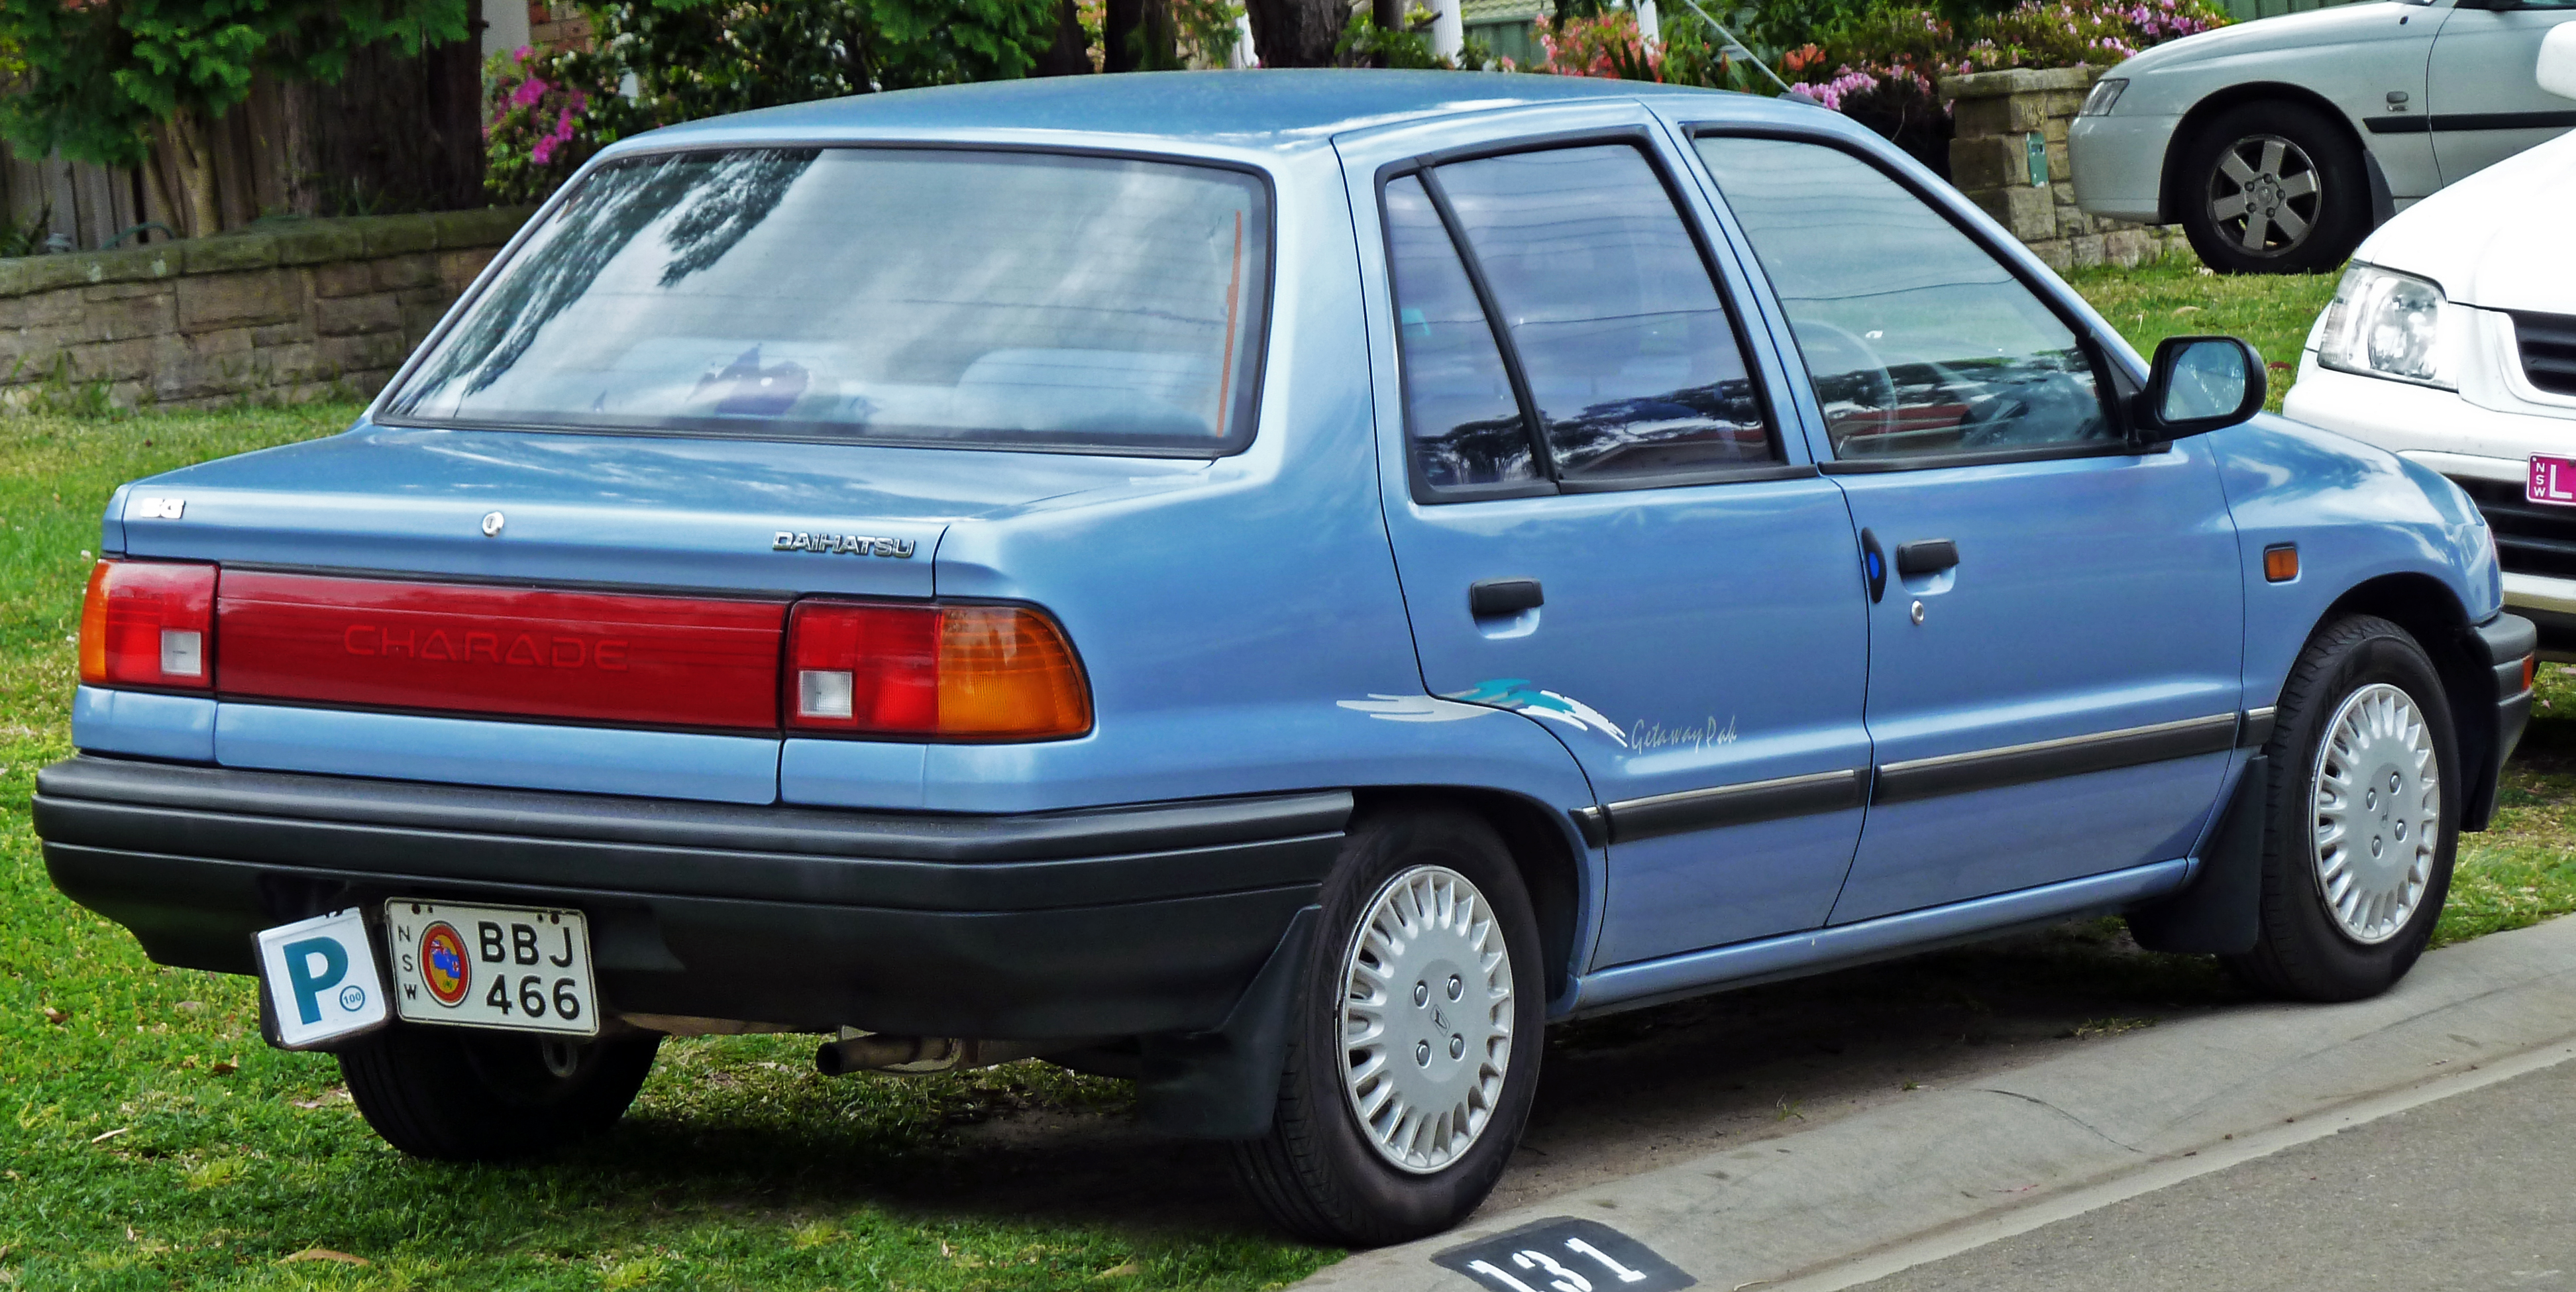 file:1991-1993 daihatsu charade (g102) sg getaway pack sedan (2010